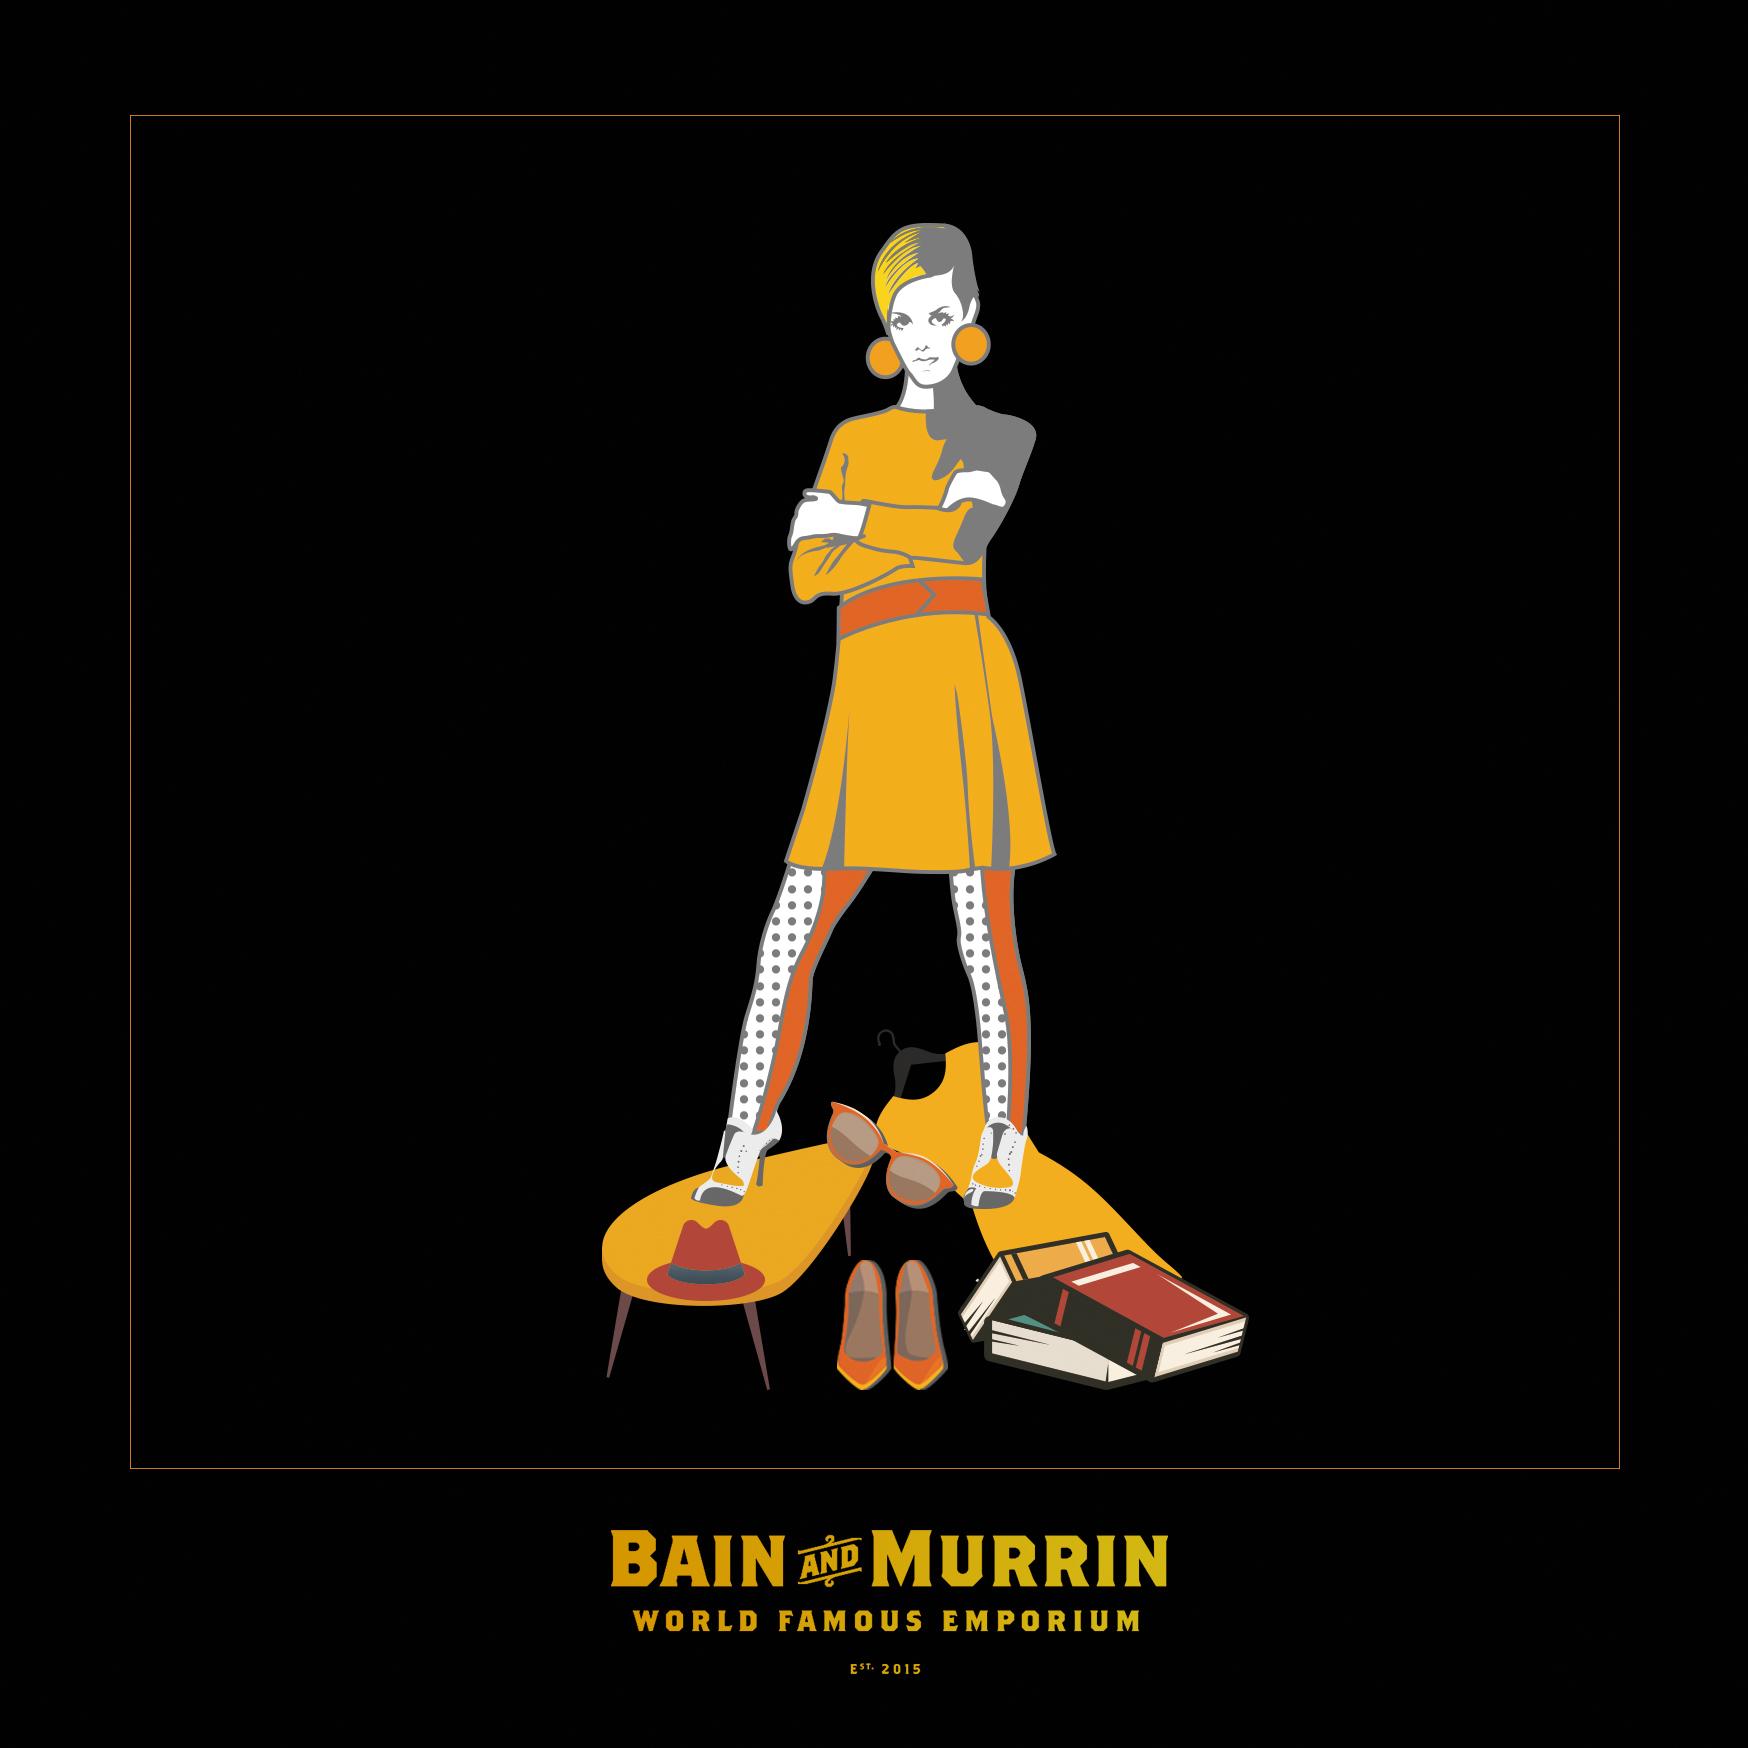 Bain&Murrin v5.jpg